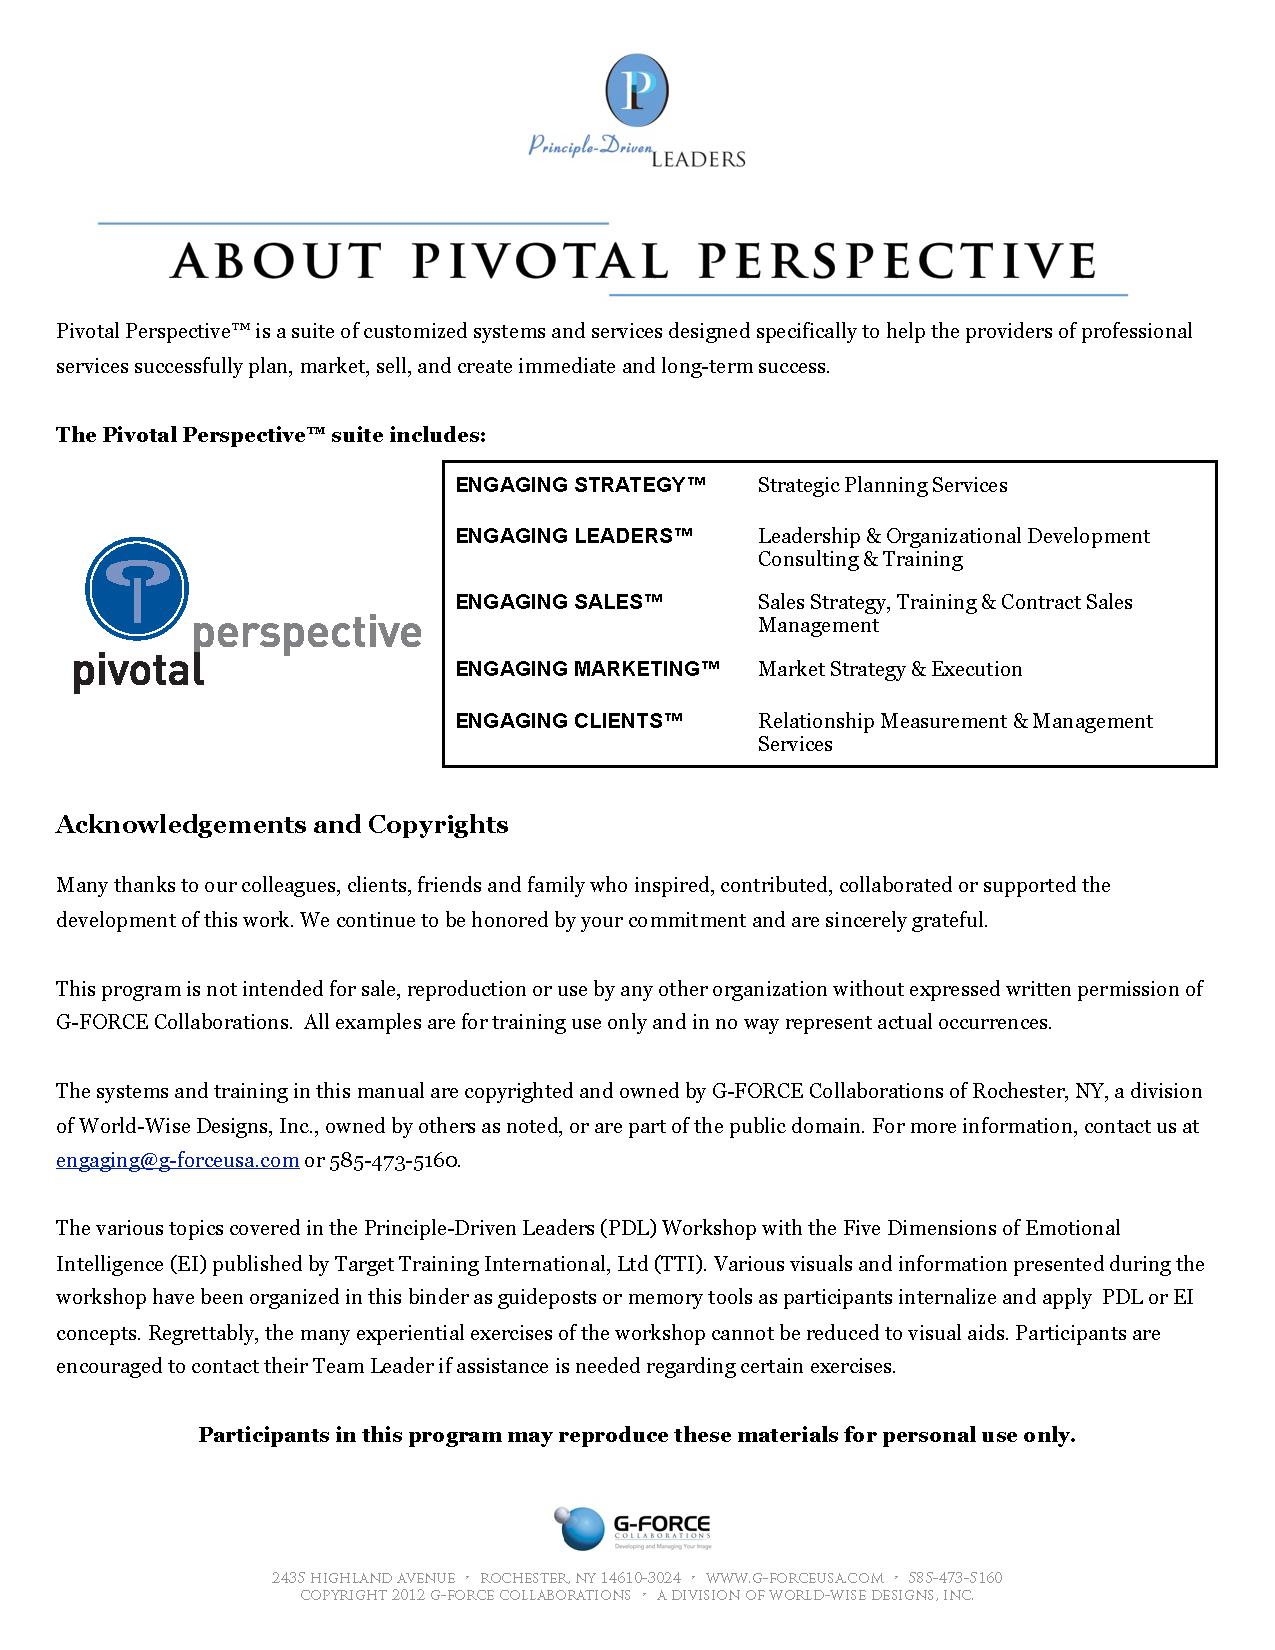 PDL Course Handout v9_Page_03.png